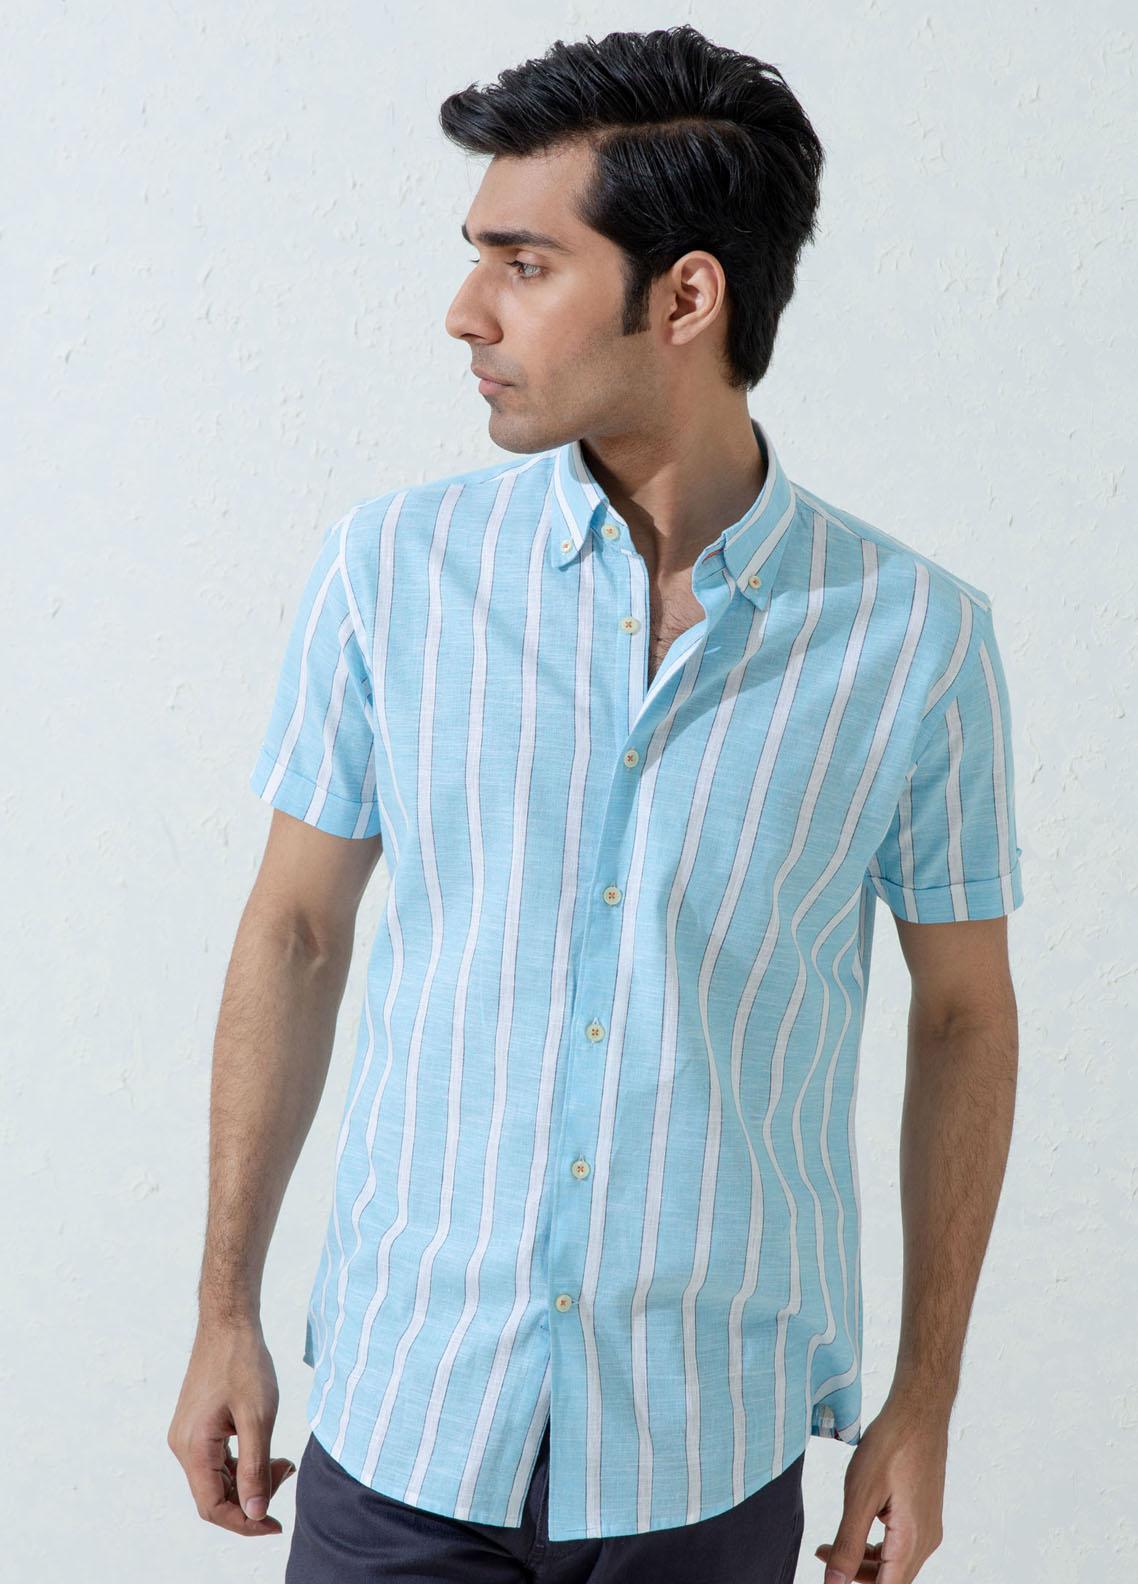 Brumano Cotton Casual Men Shirts -  Blue Linen Striped Half Sleeve